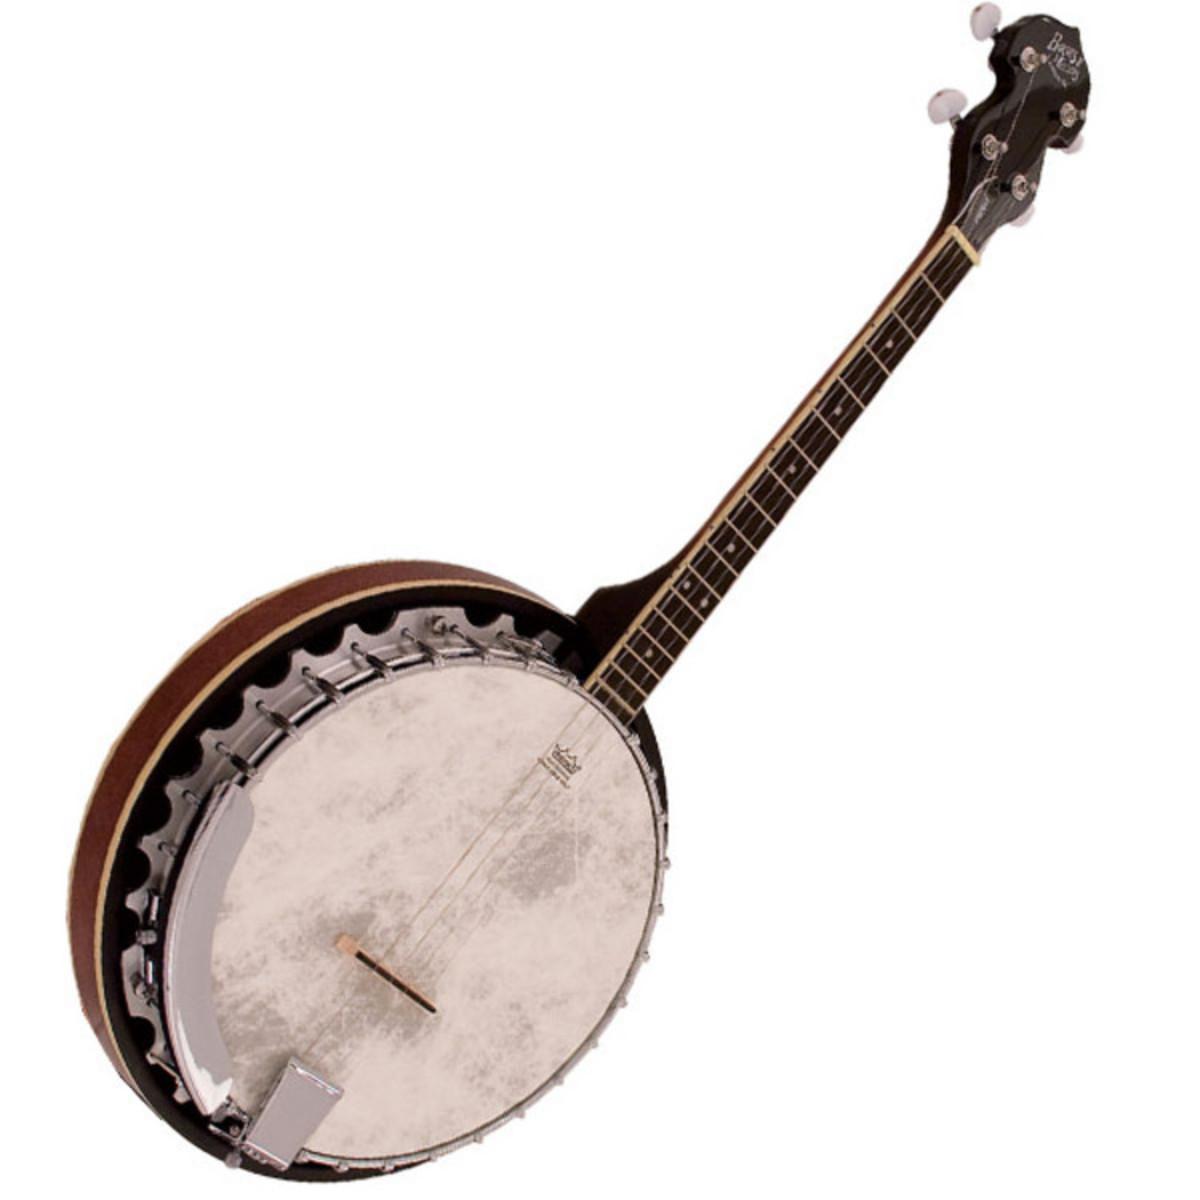 Barnes & Mullins BJ304GT Gaelic 4 String Banjo